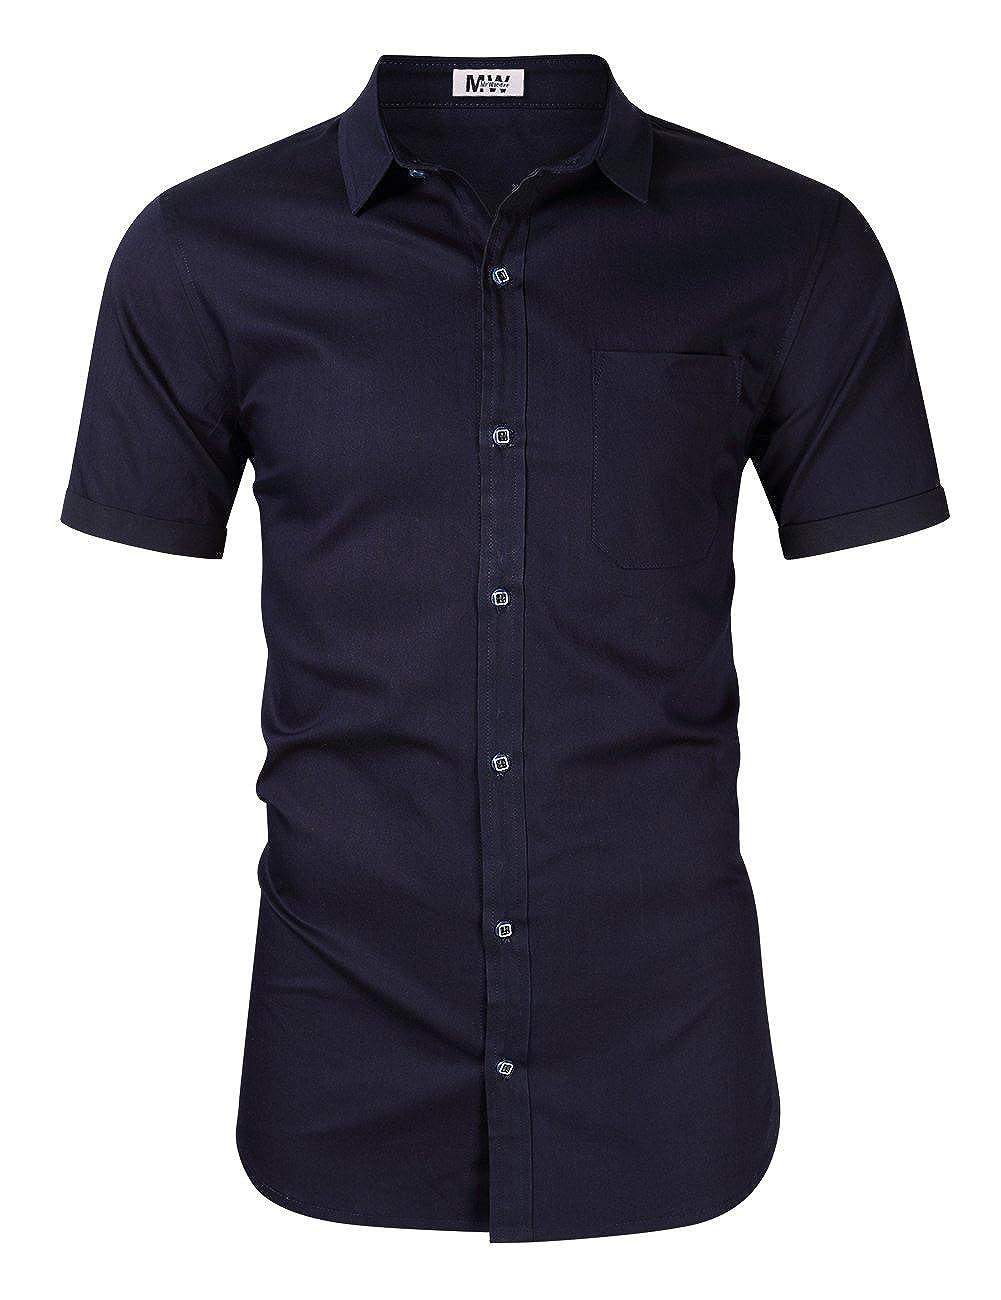 c44effa6 MrWonder Men's Casual Slim Fit Button Down Dress Shirt Short Sleeve Denim  Shirts Jean Shirt at Amazon Men's Clothing store: